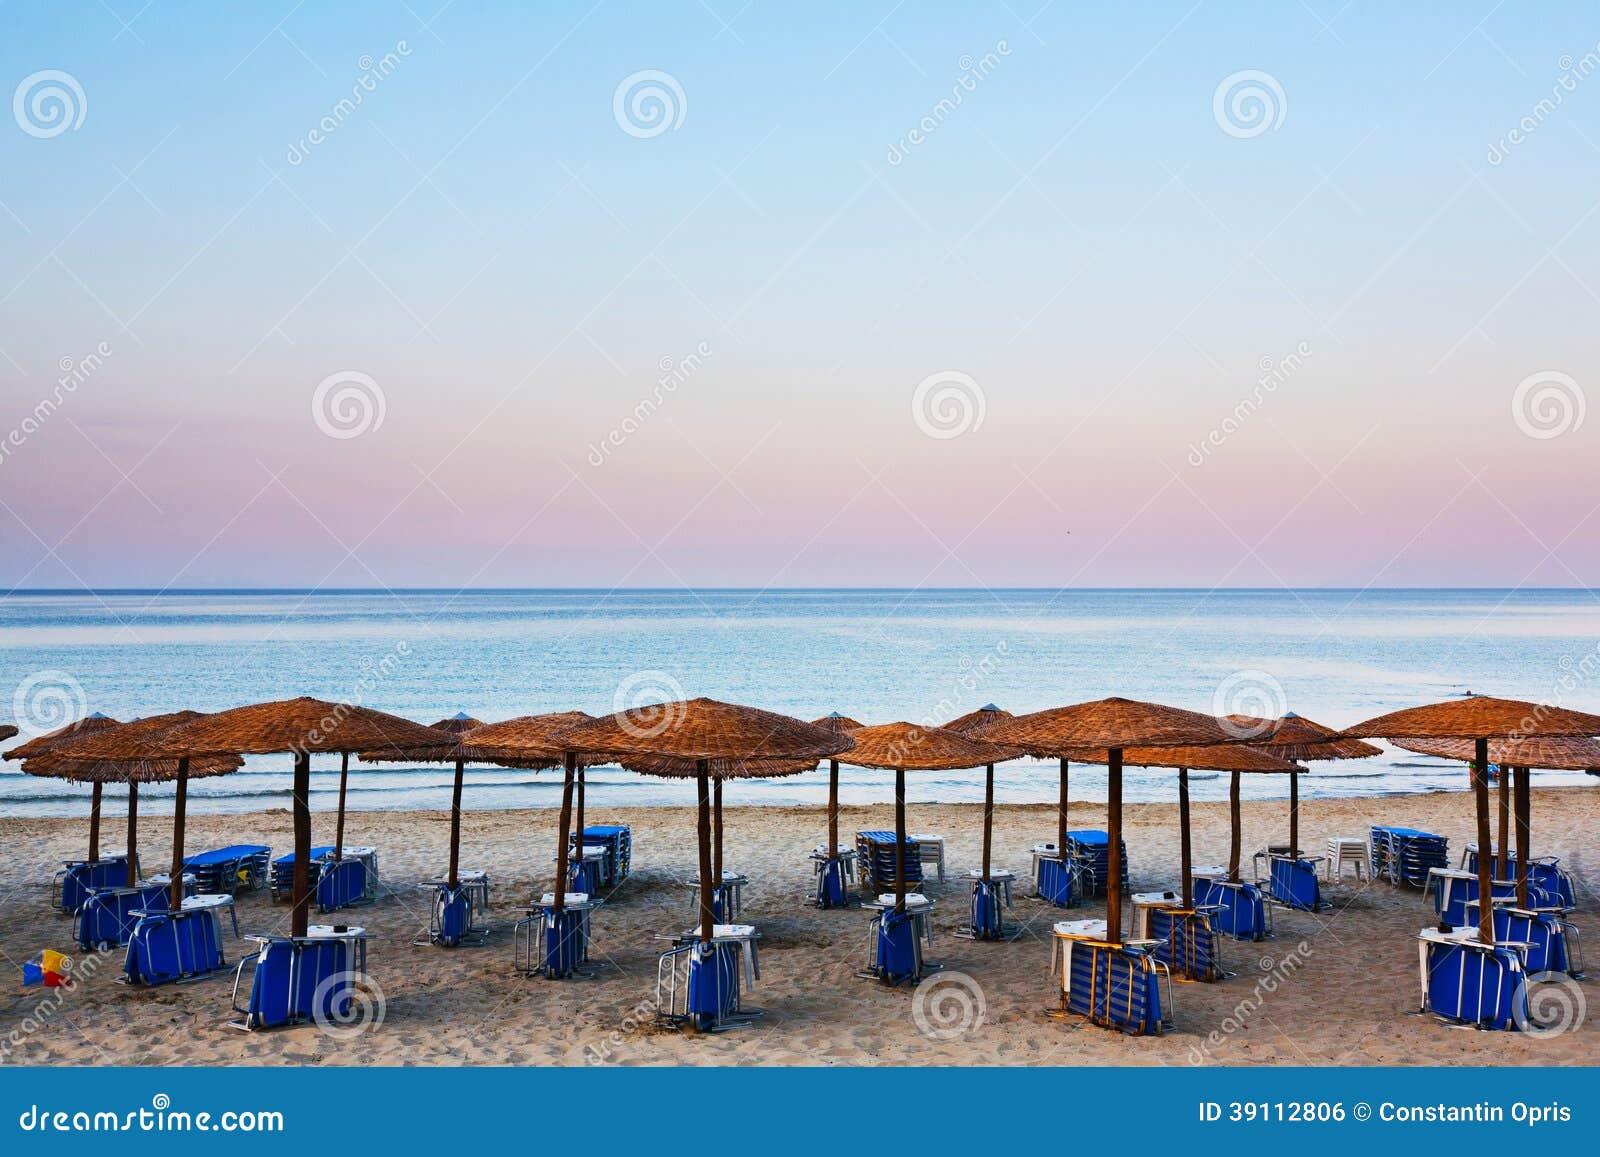 Strandbedden en paraplu s